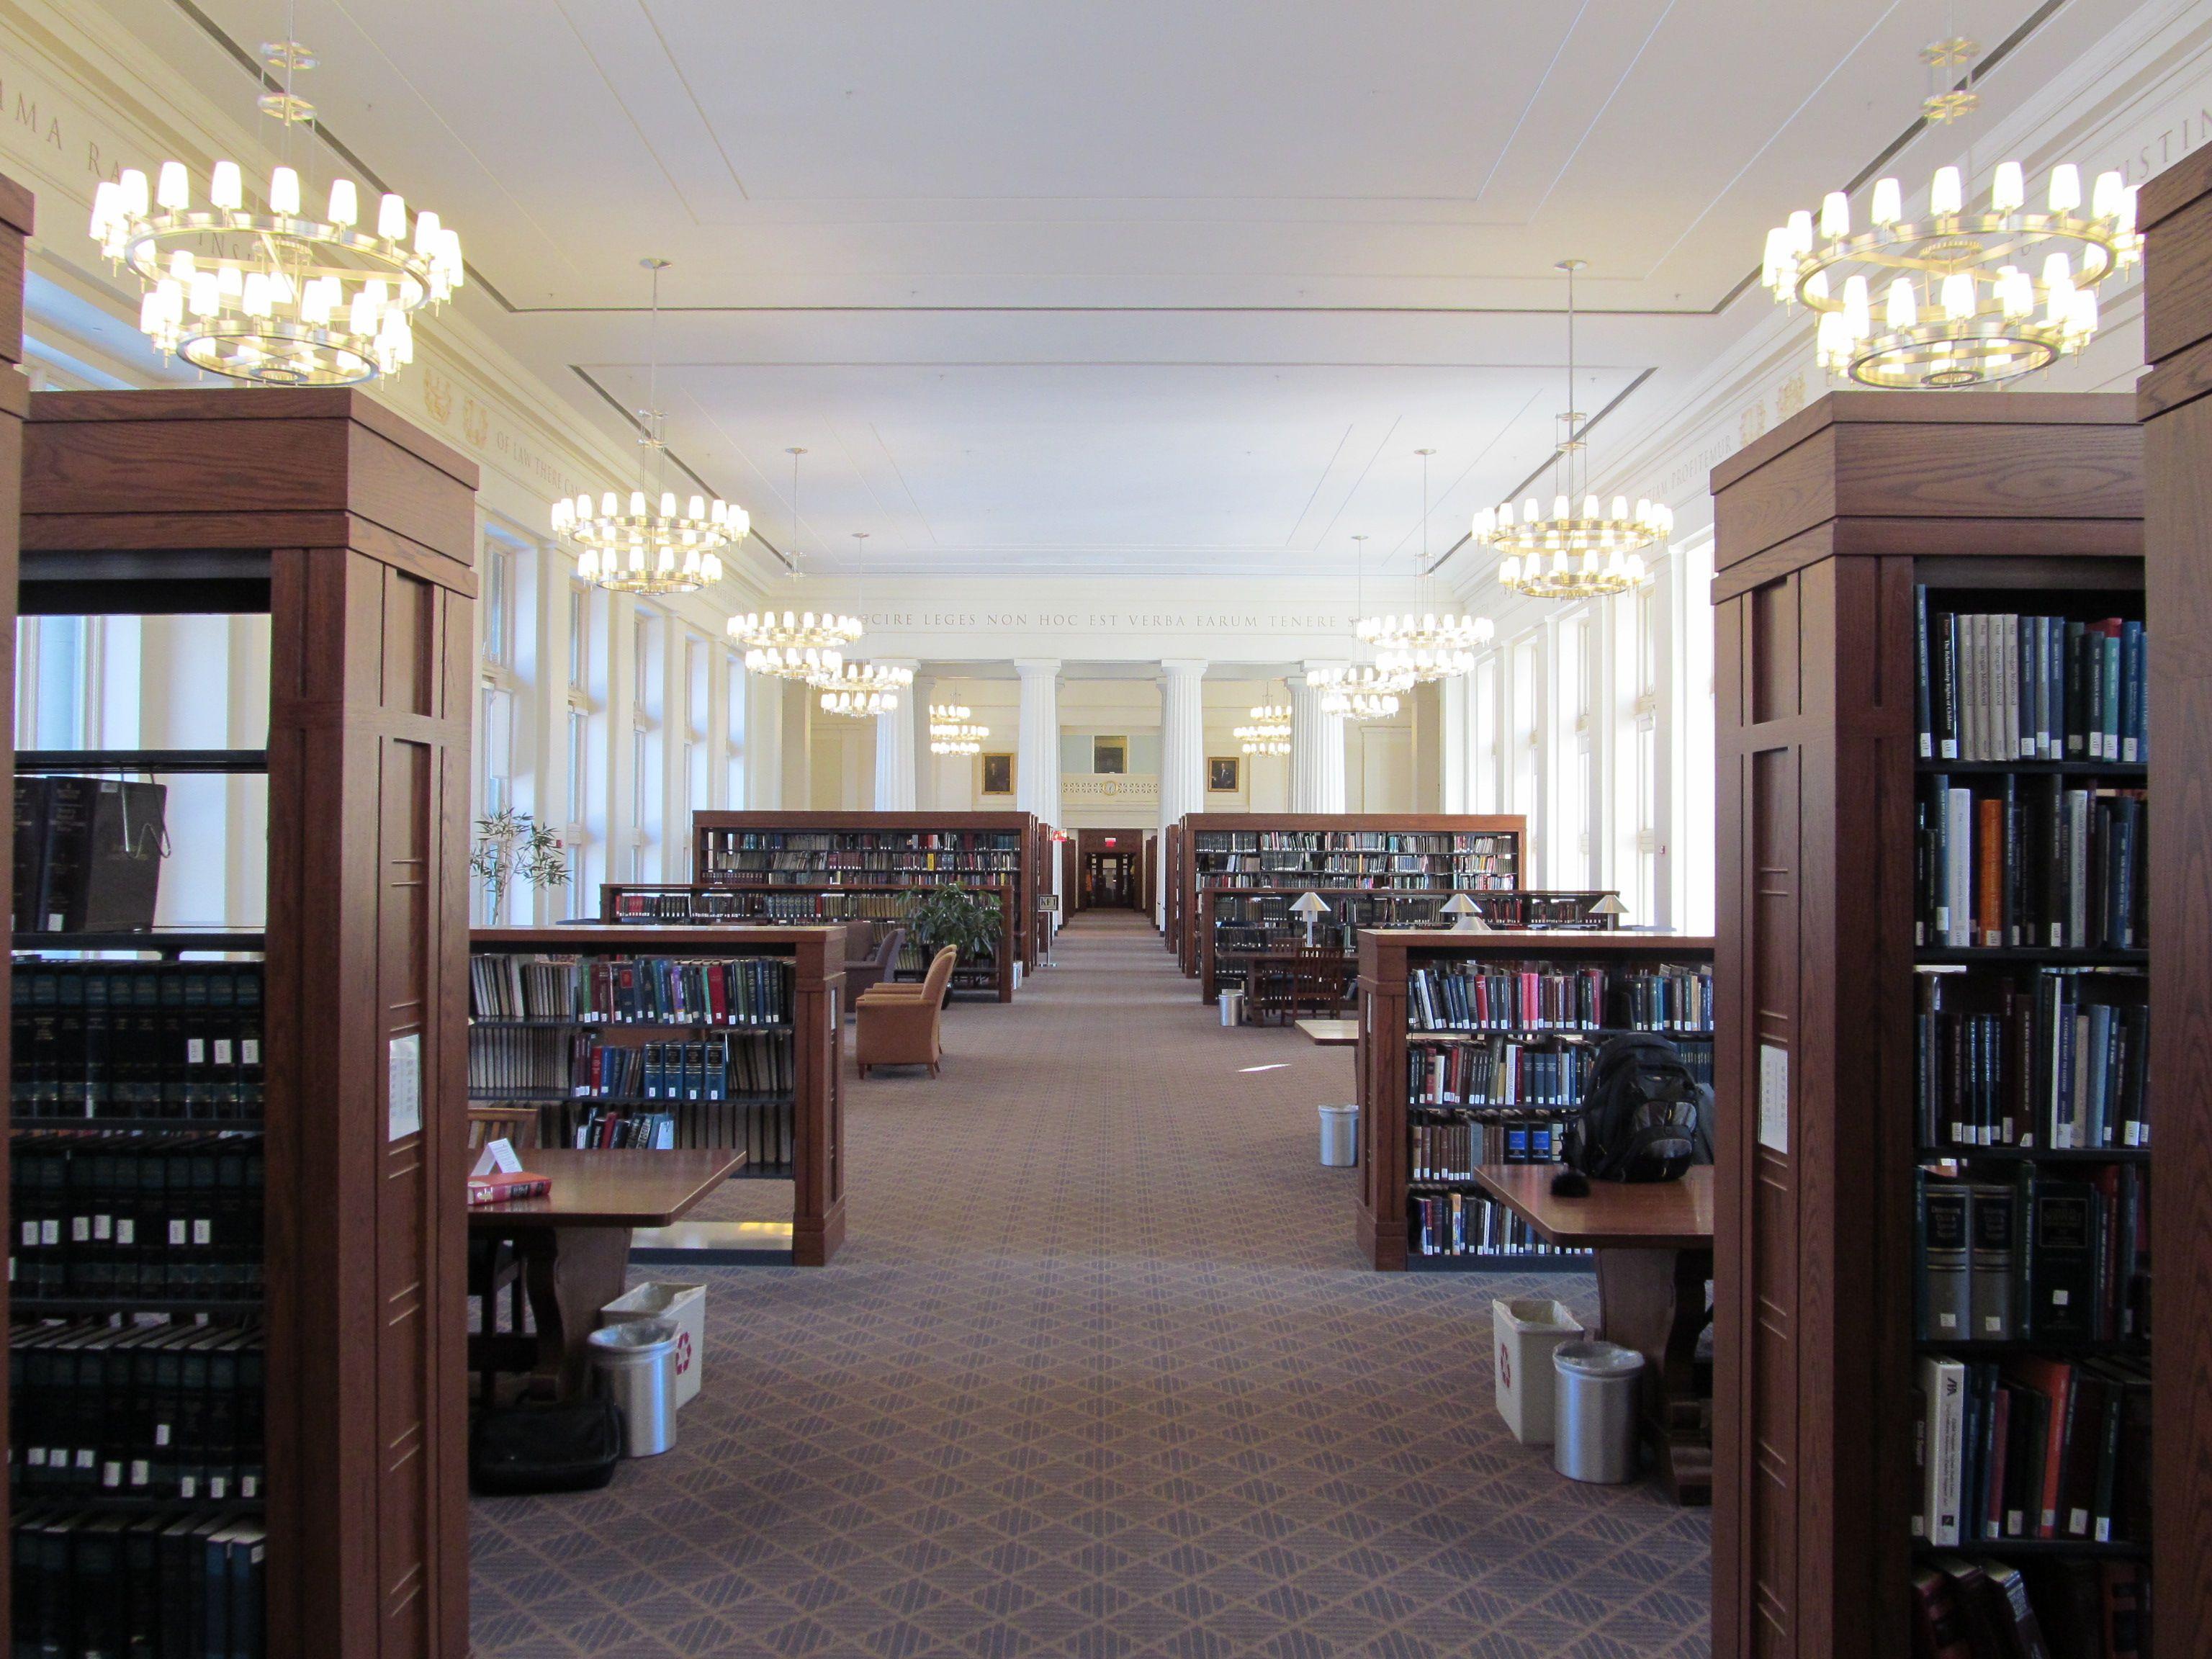 Dorm rooms at harvard harvard university law libraries  libraries  pinterest  harvard